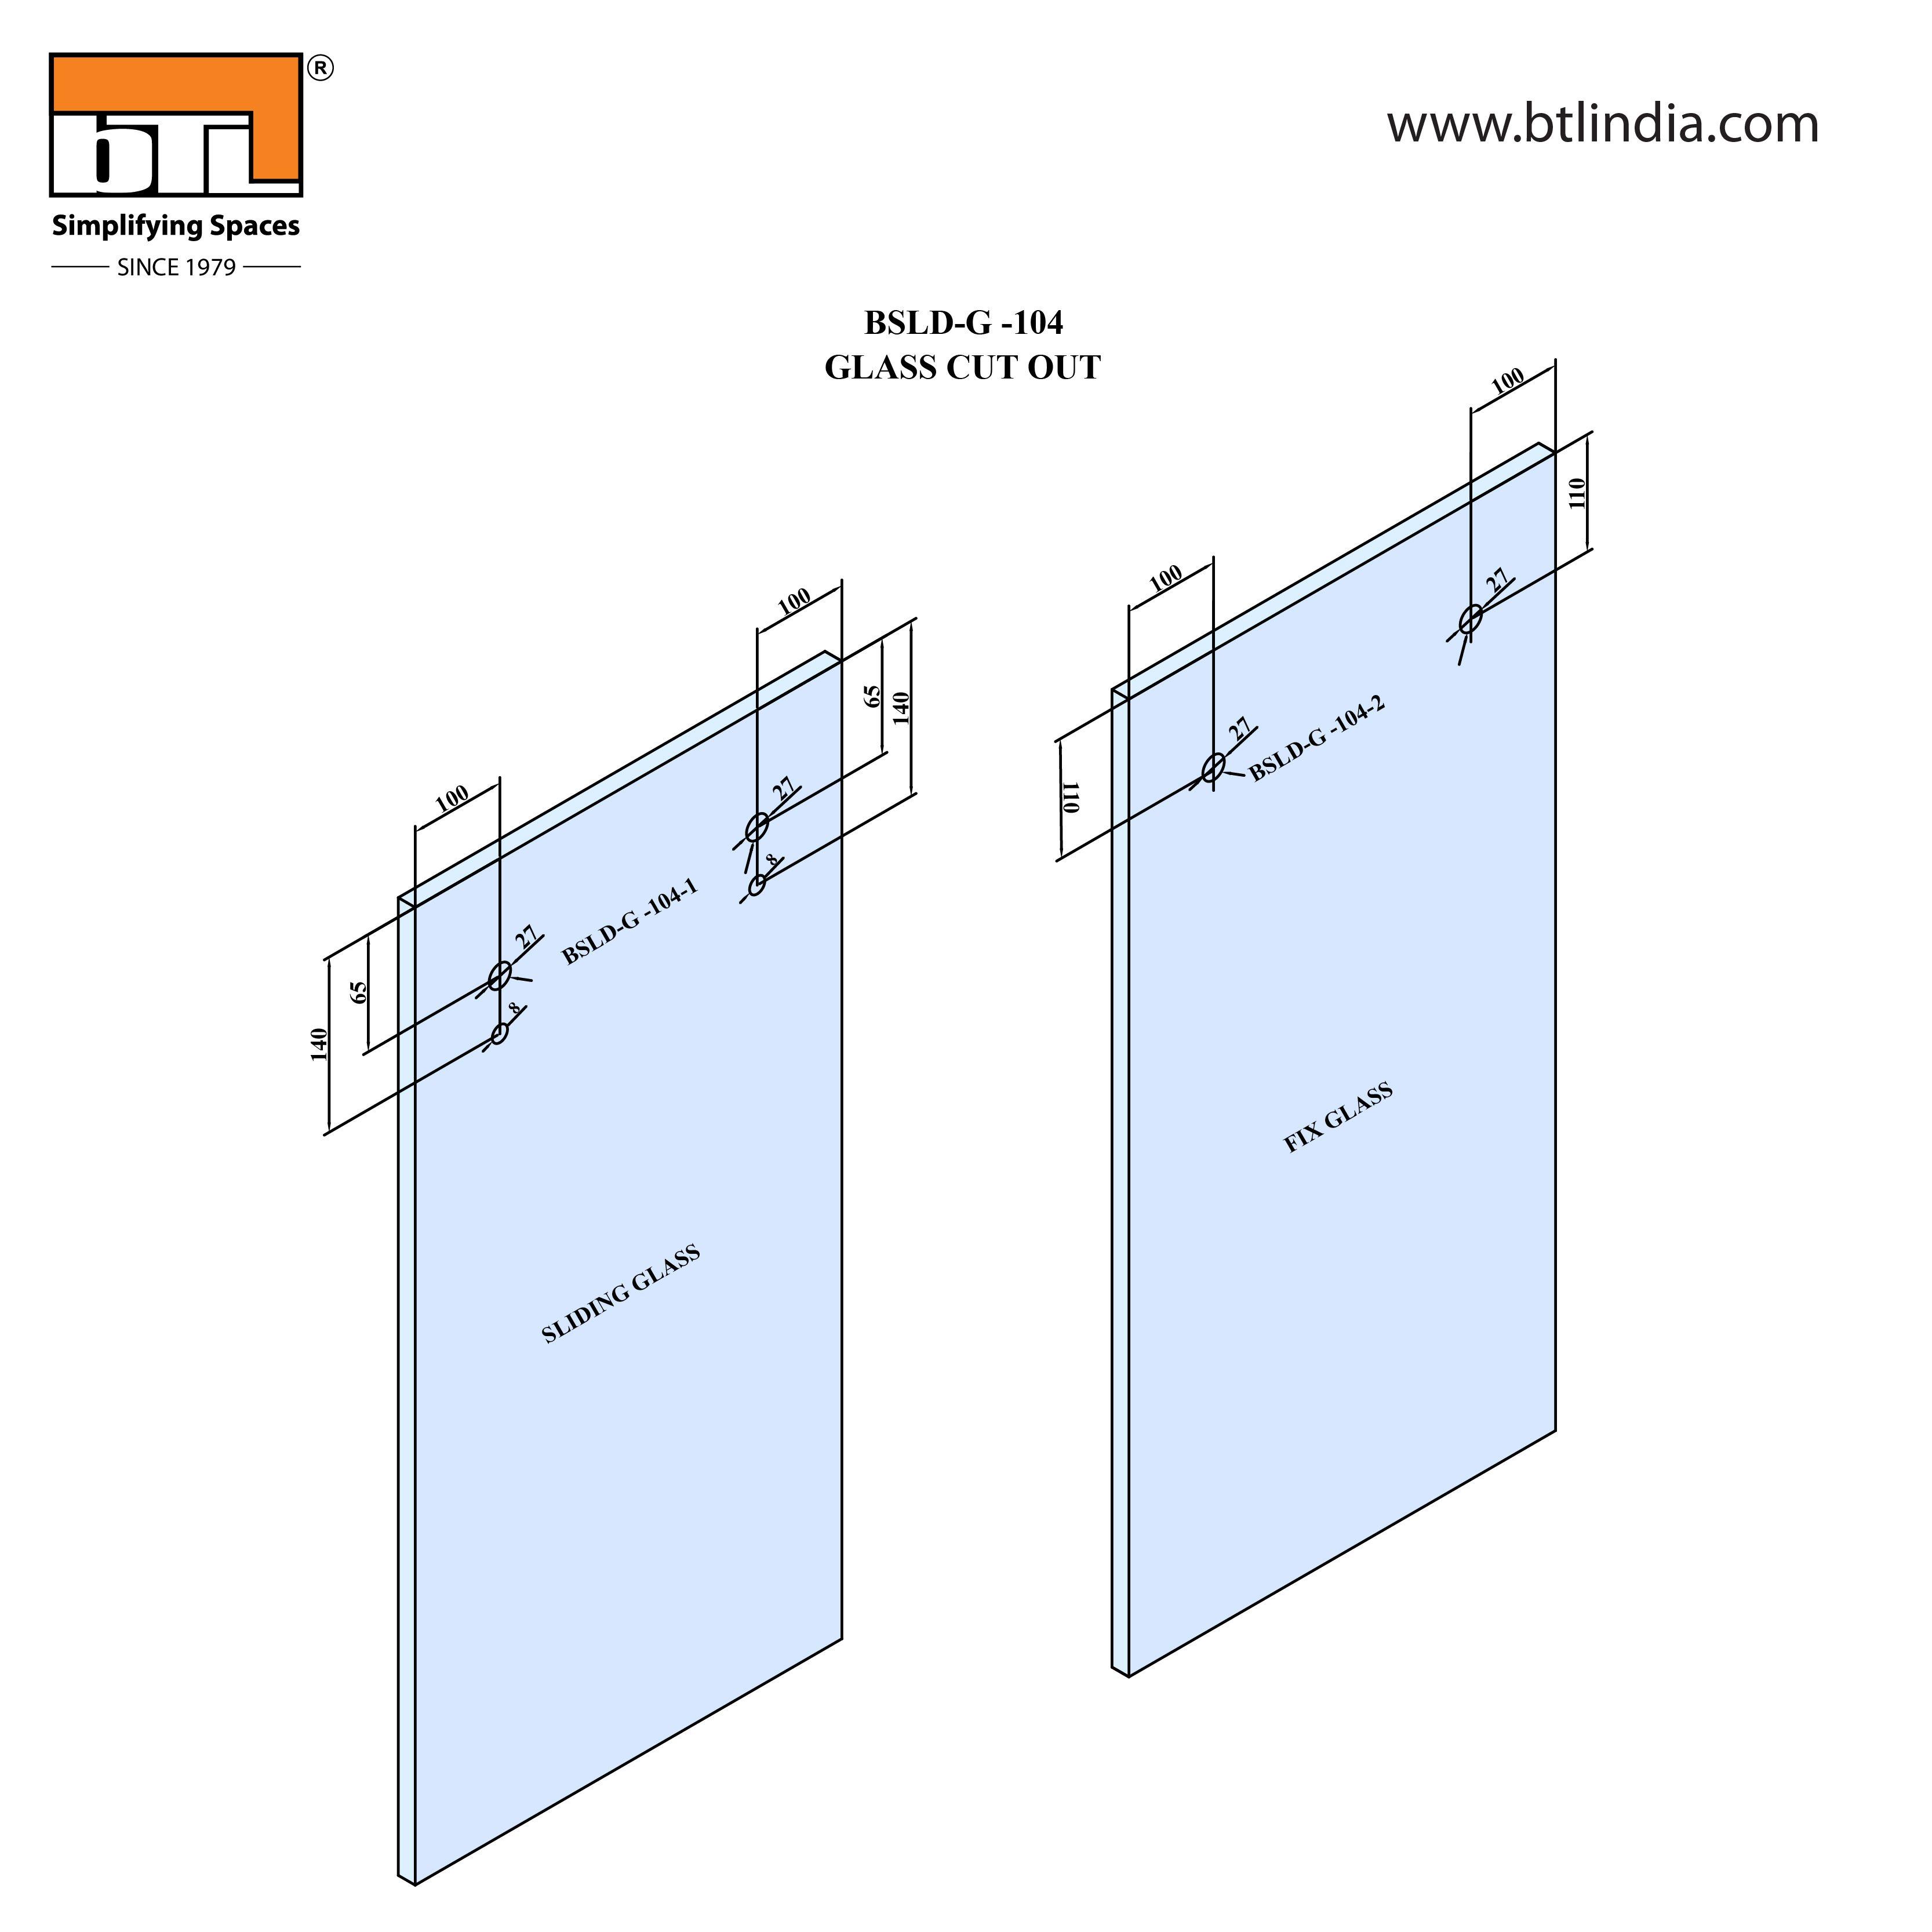 BTL Glass Door Sliding Set - G104 - Installation Instruction with Glass Door Cut out